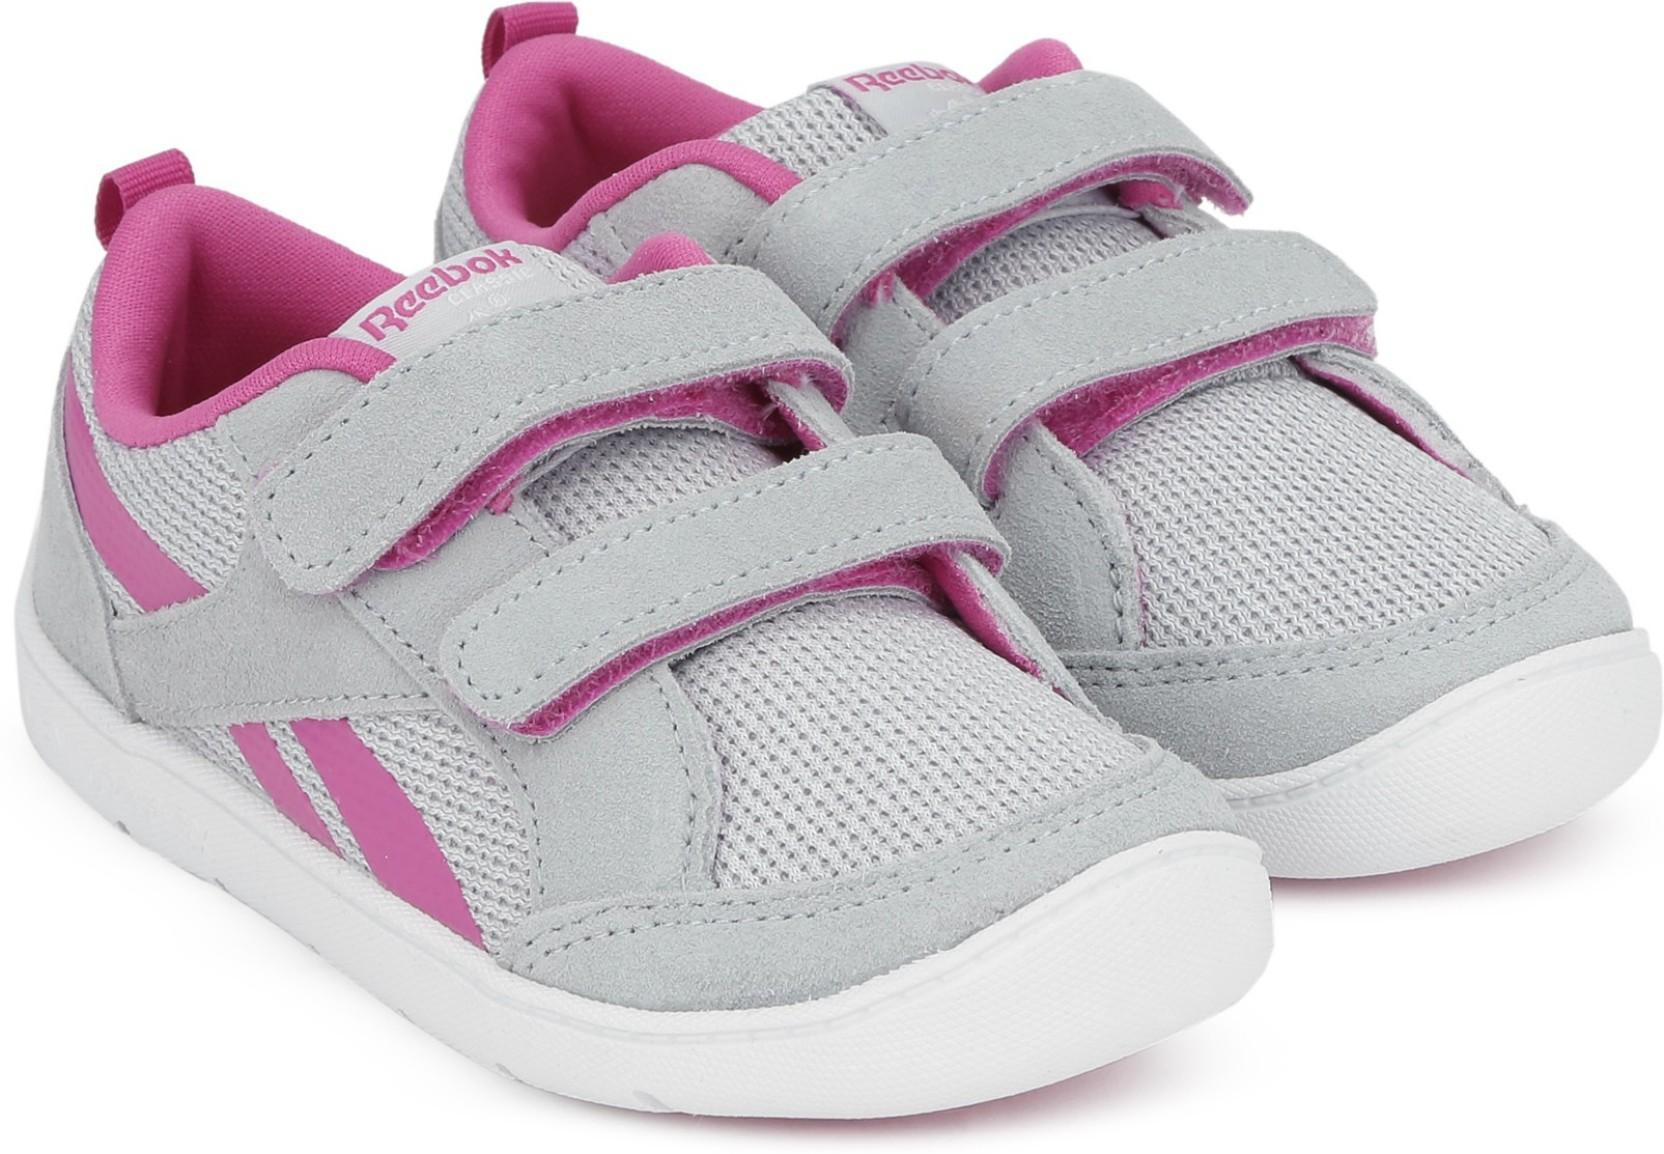 94bf643f417 REEBOK Boys   Girls Velcro Sneakers Price in India - Buy REEBOK Boys ...